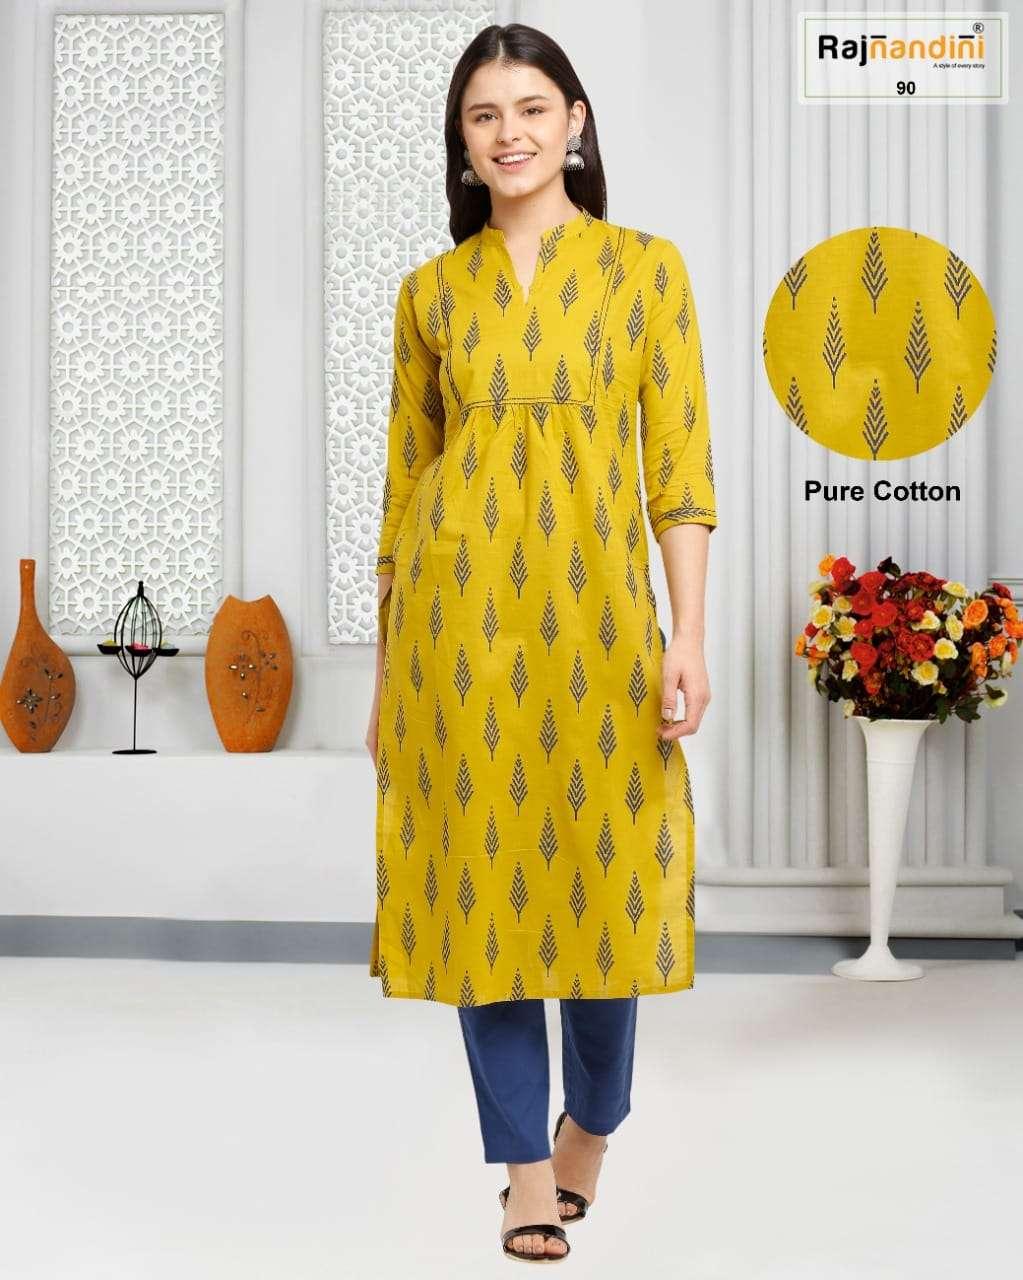 Rajnandini Vol 29 Printed Daily Wear Cotton Kurti New Designs